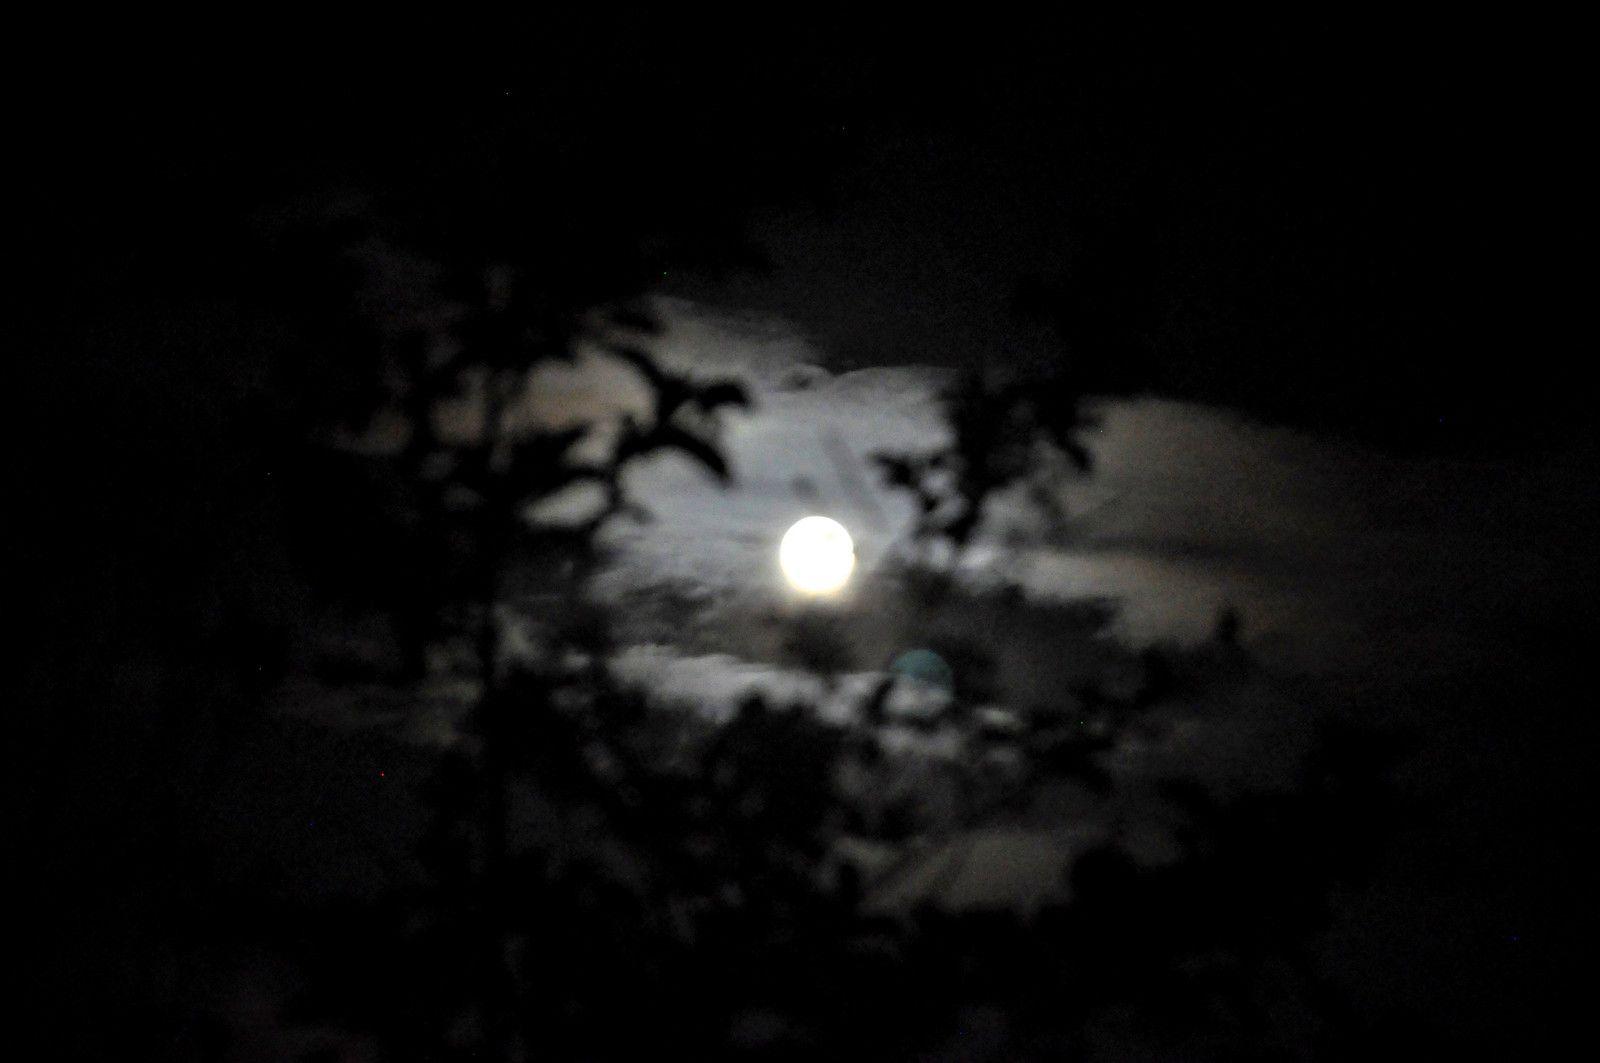 Petit jeu avec la lune.